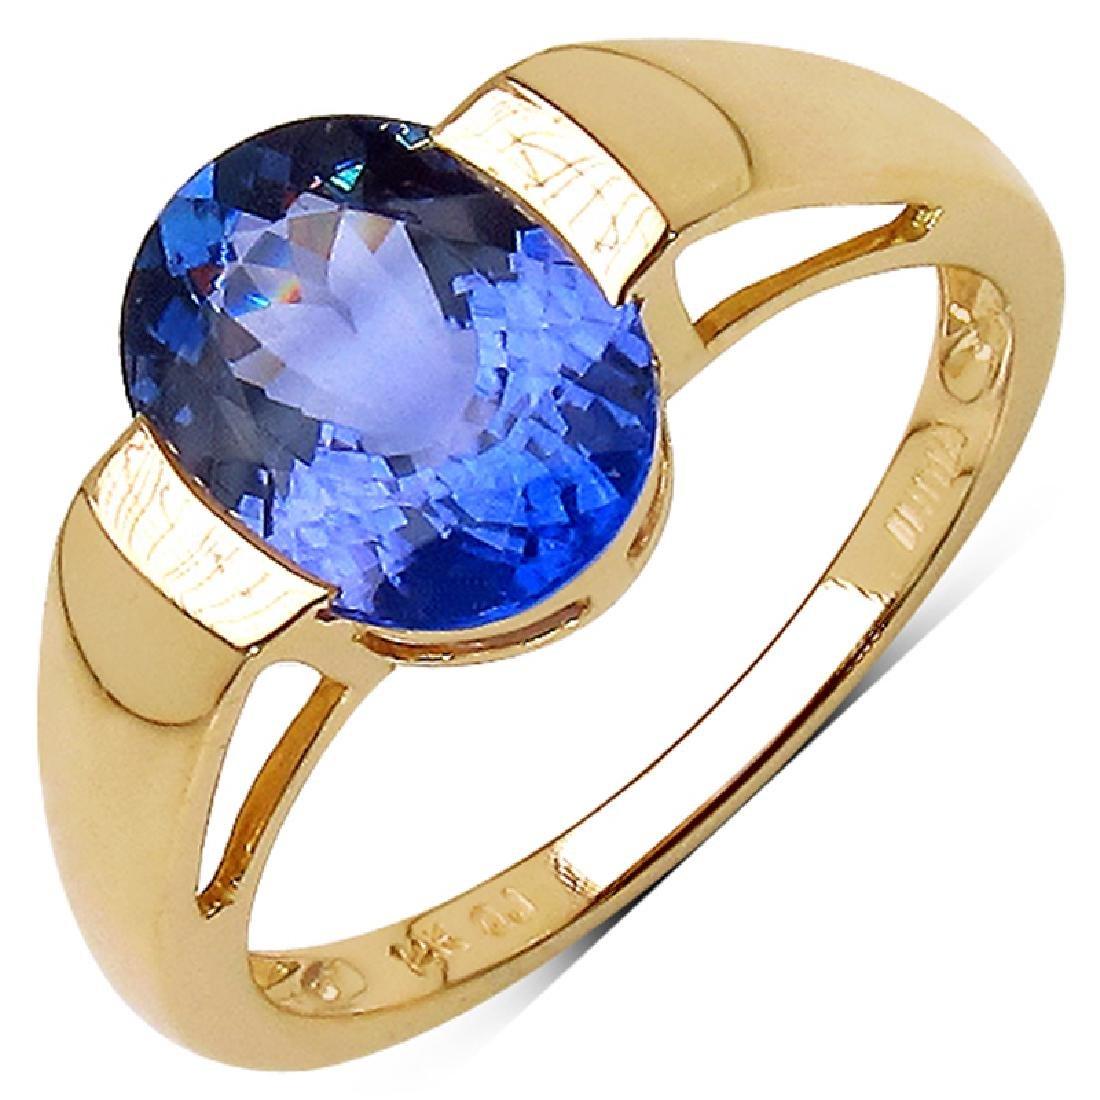 APP: 4.4k *Fine Jewelry 14 kt. Gold, 2.60CT Oval Cut